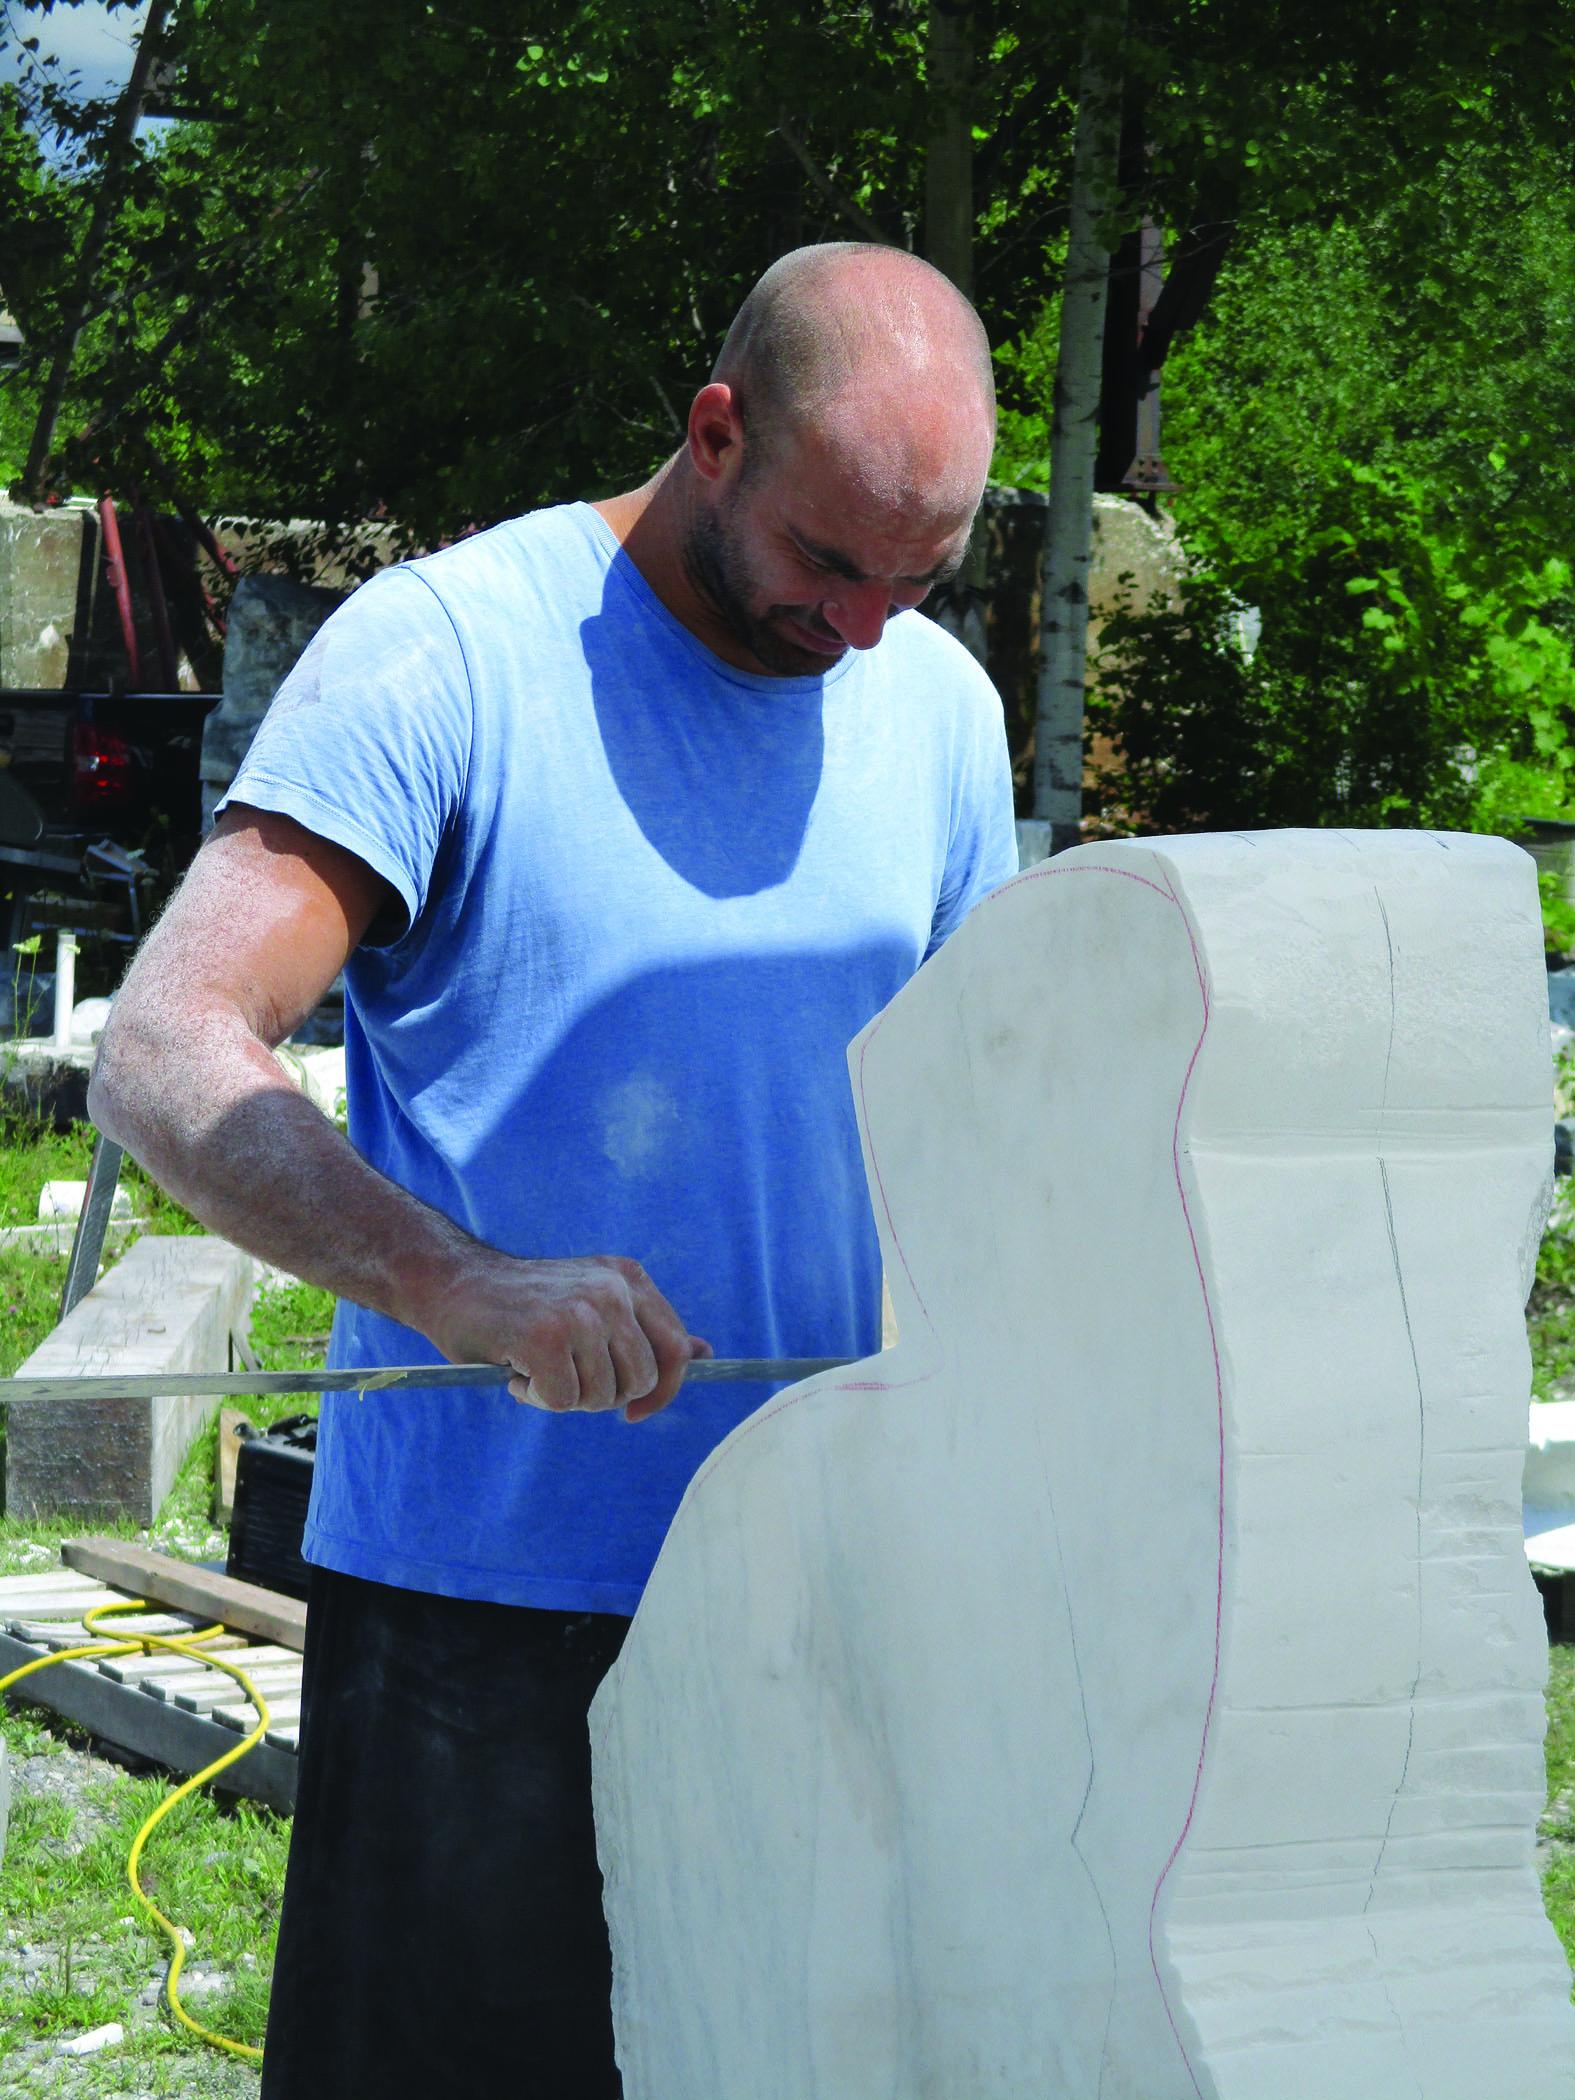 Sculpture Artist Residencies & Art Internships: Carving Studio